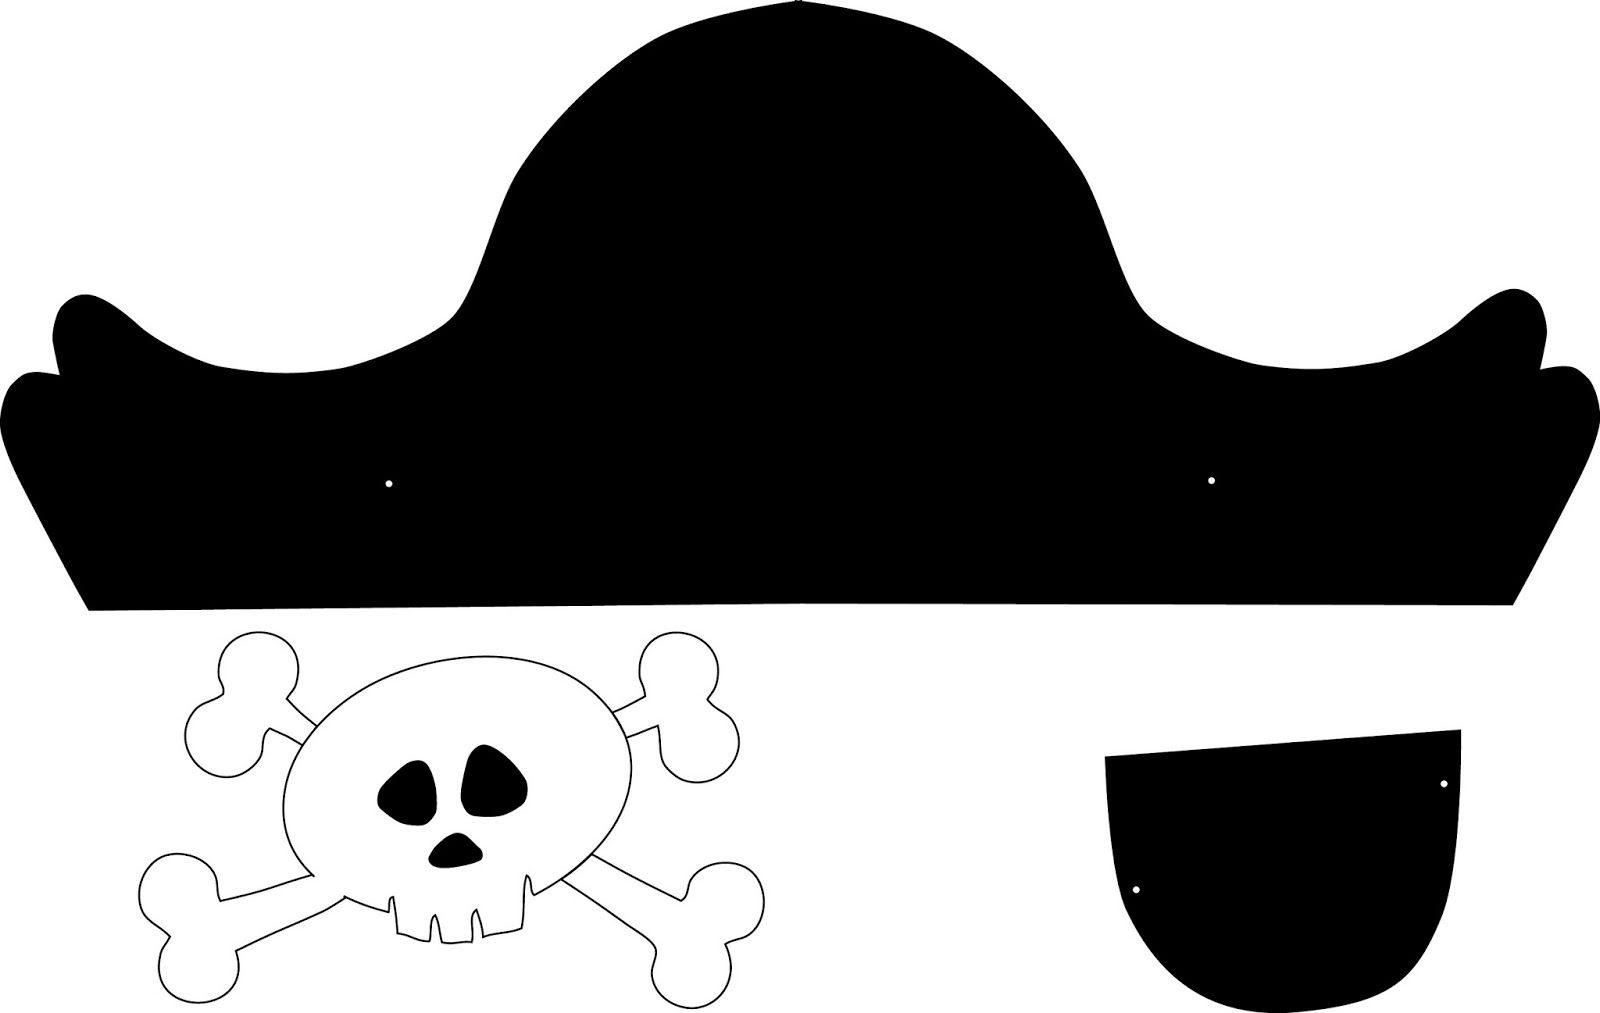 fiesta pirata para niños - Buscar con Google | itsaslapurrek ...